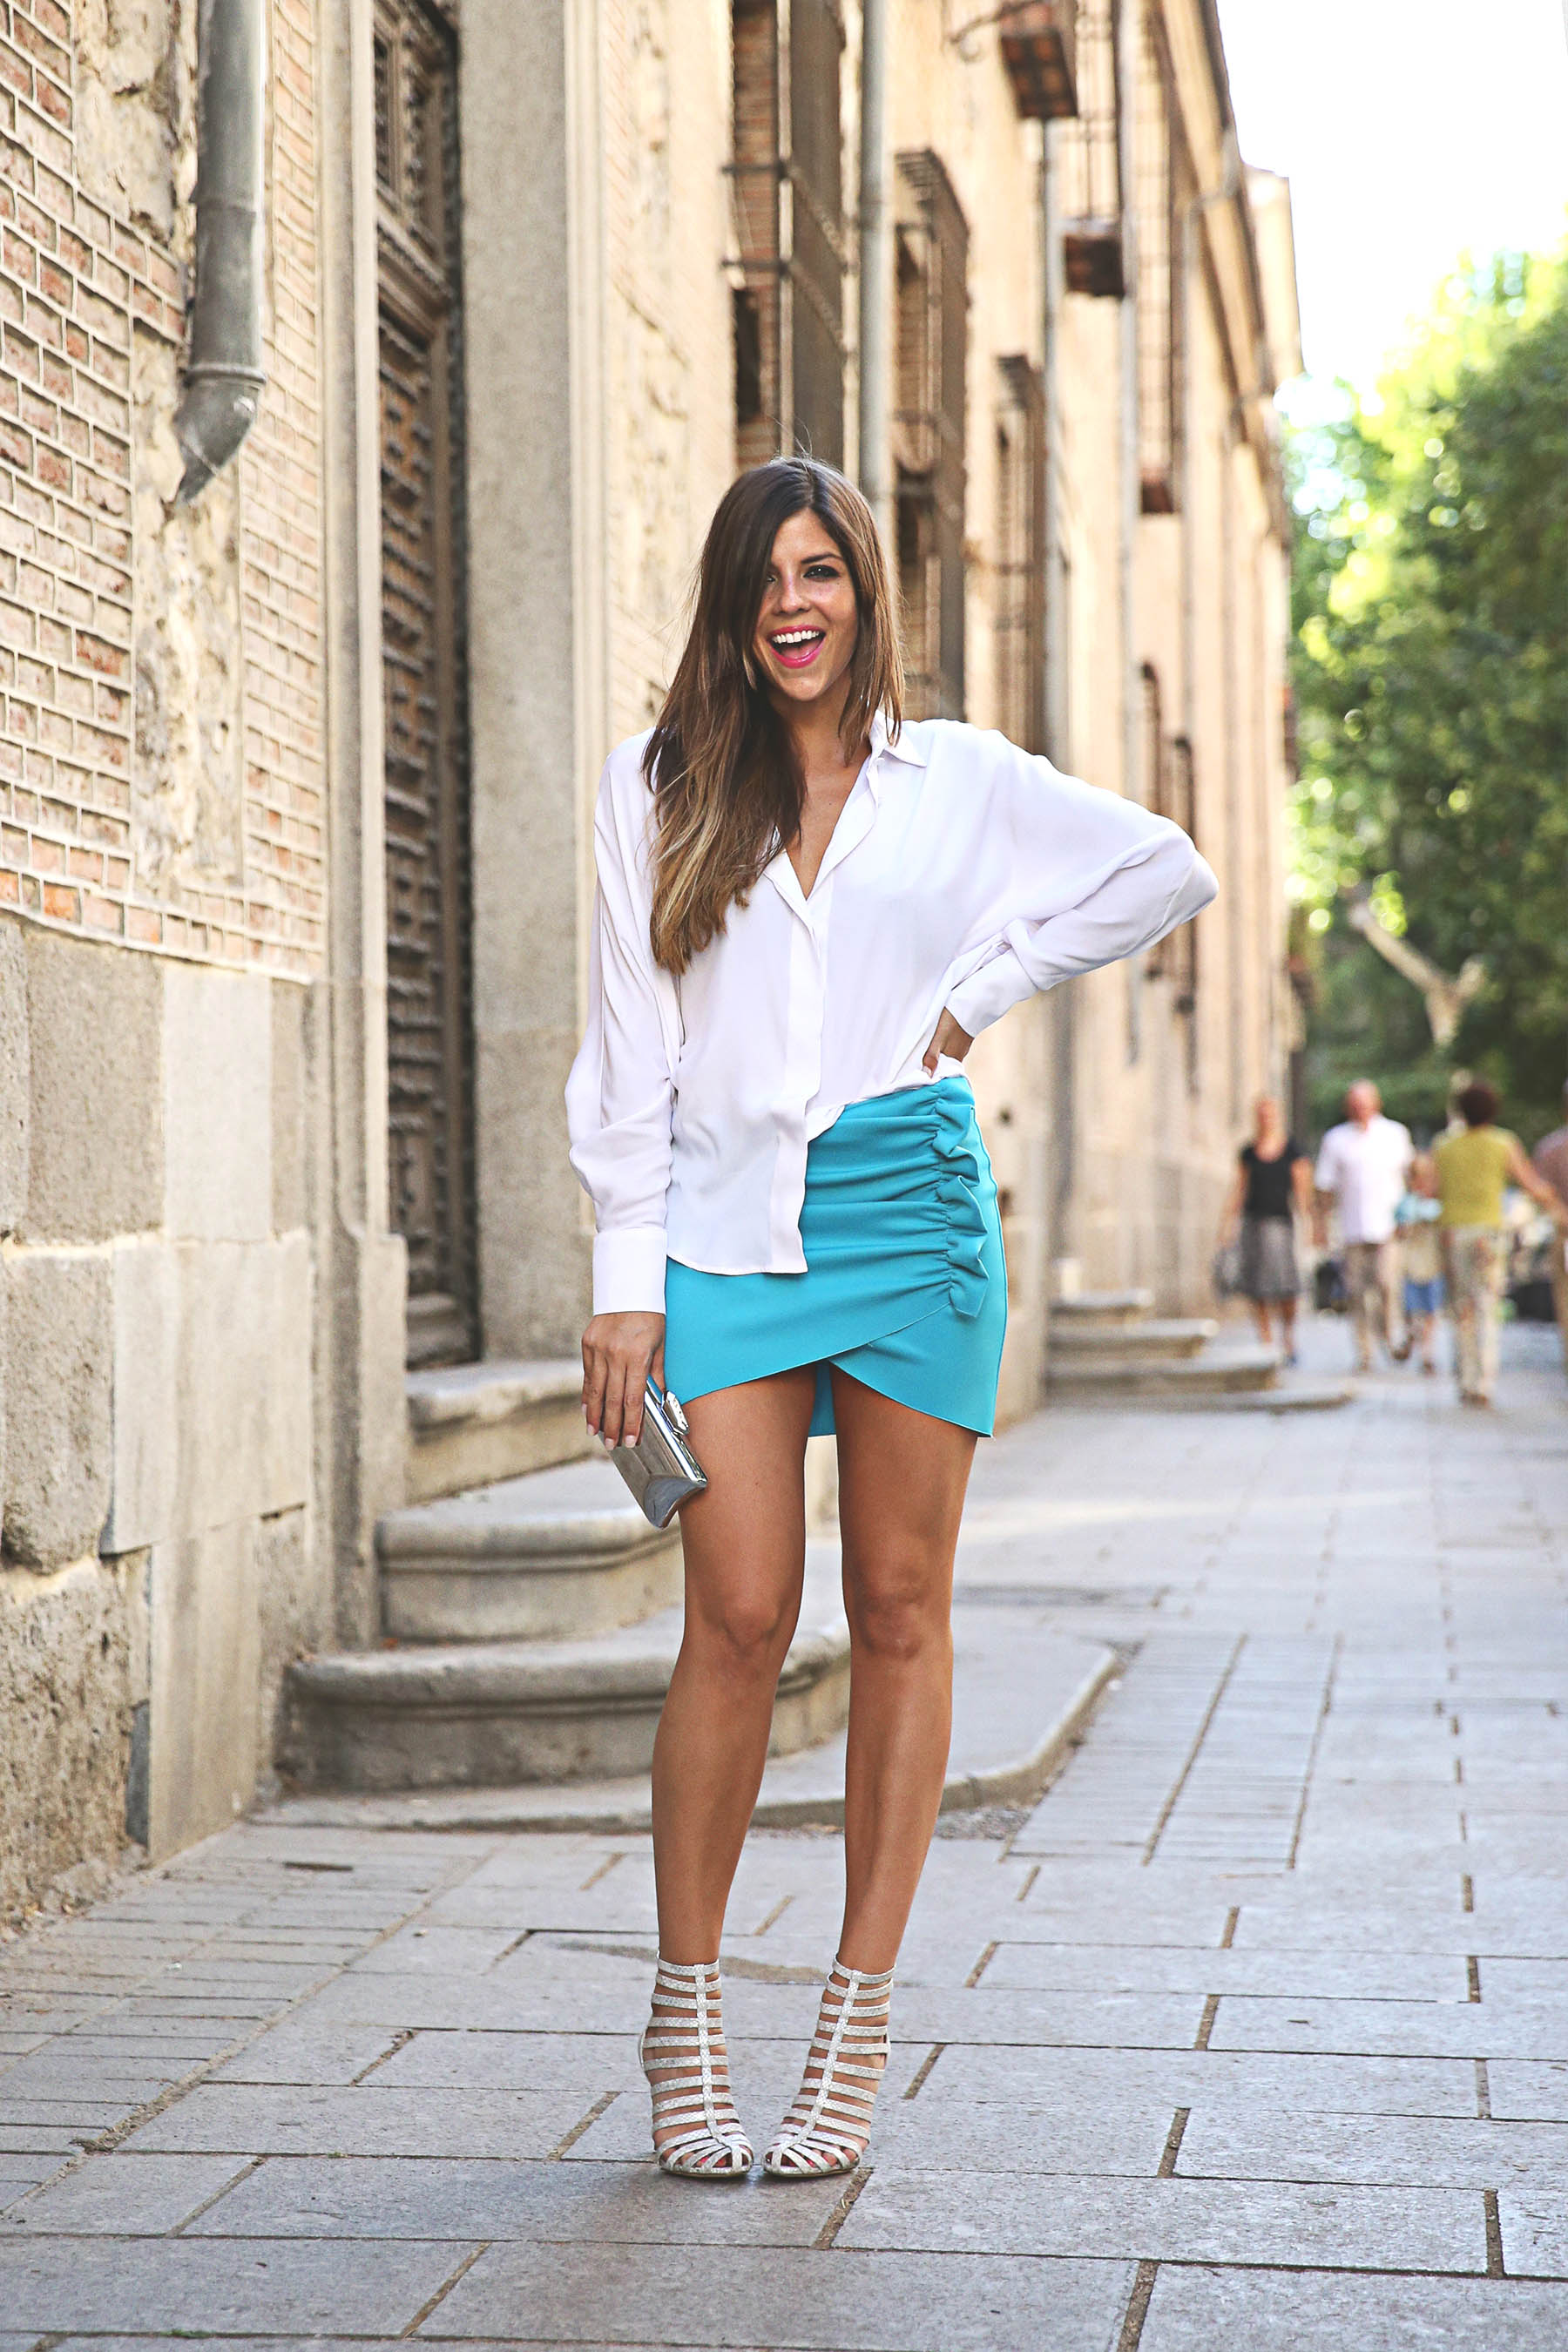 trendy-taste-look-outfit-street-style-ootd-blog-blogger-fashion-spain-moda-españa-lolali-blue-neopreno-azul-falda-blusa-bcbg-338-sandalias-serpiente-9